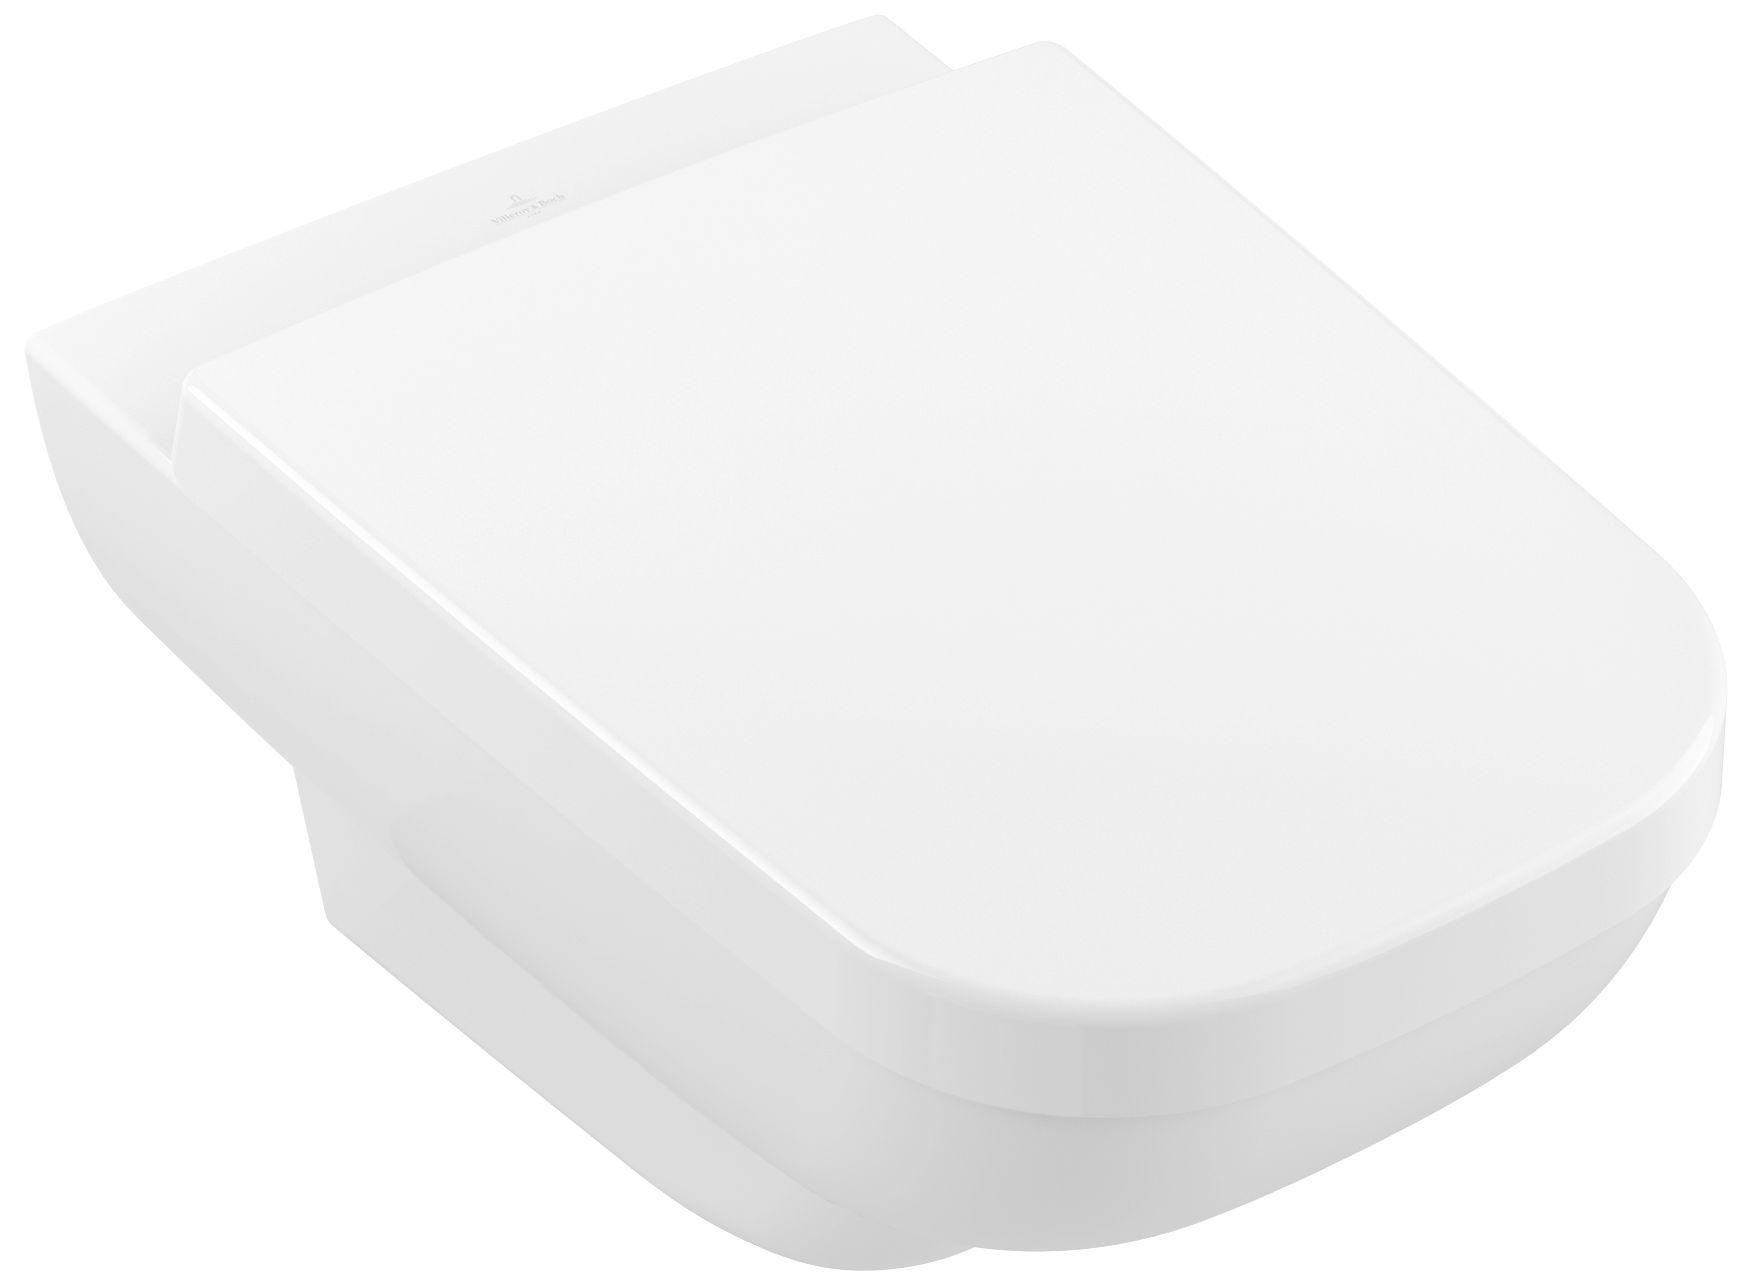 Villeroy & Boch Joyce Combi-Pack mit Wand-Tiefspül-WC DirectFlush mit offenem Spülrand L:56xB:37cm weiß mit CeramicPlus mit WC-Sitz mit Absenkautomatik 5607R2R1